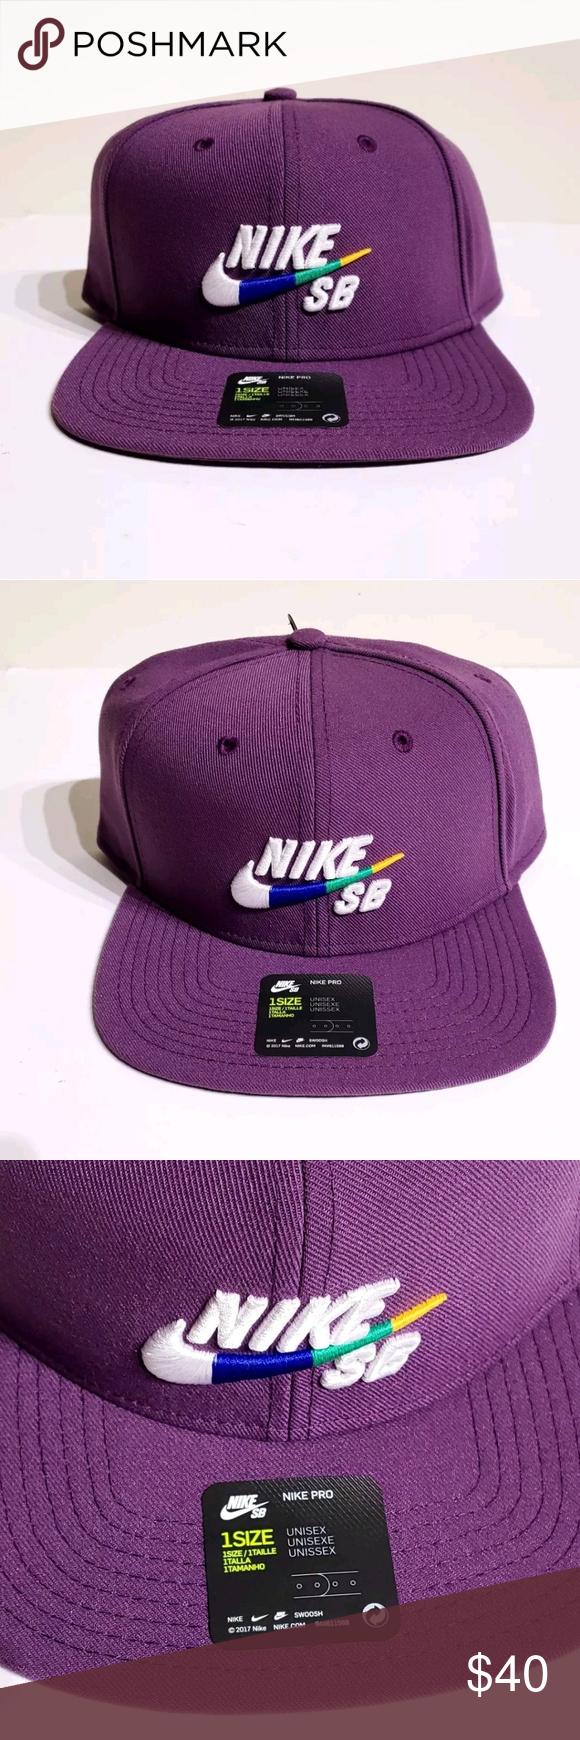 the best attitude 1bc89 57382 Nike Pro SB Logo Snapback Purple Hat 62863 517 New with Tags Nike Pro SB  Icon Logo Skateboarding Snapback Hat Style  628683-517 Size  One Size Fits  All ...